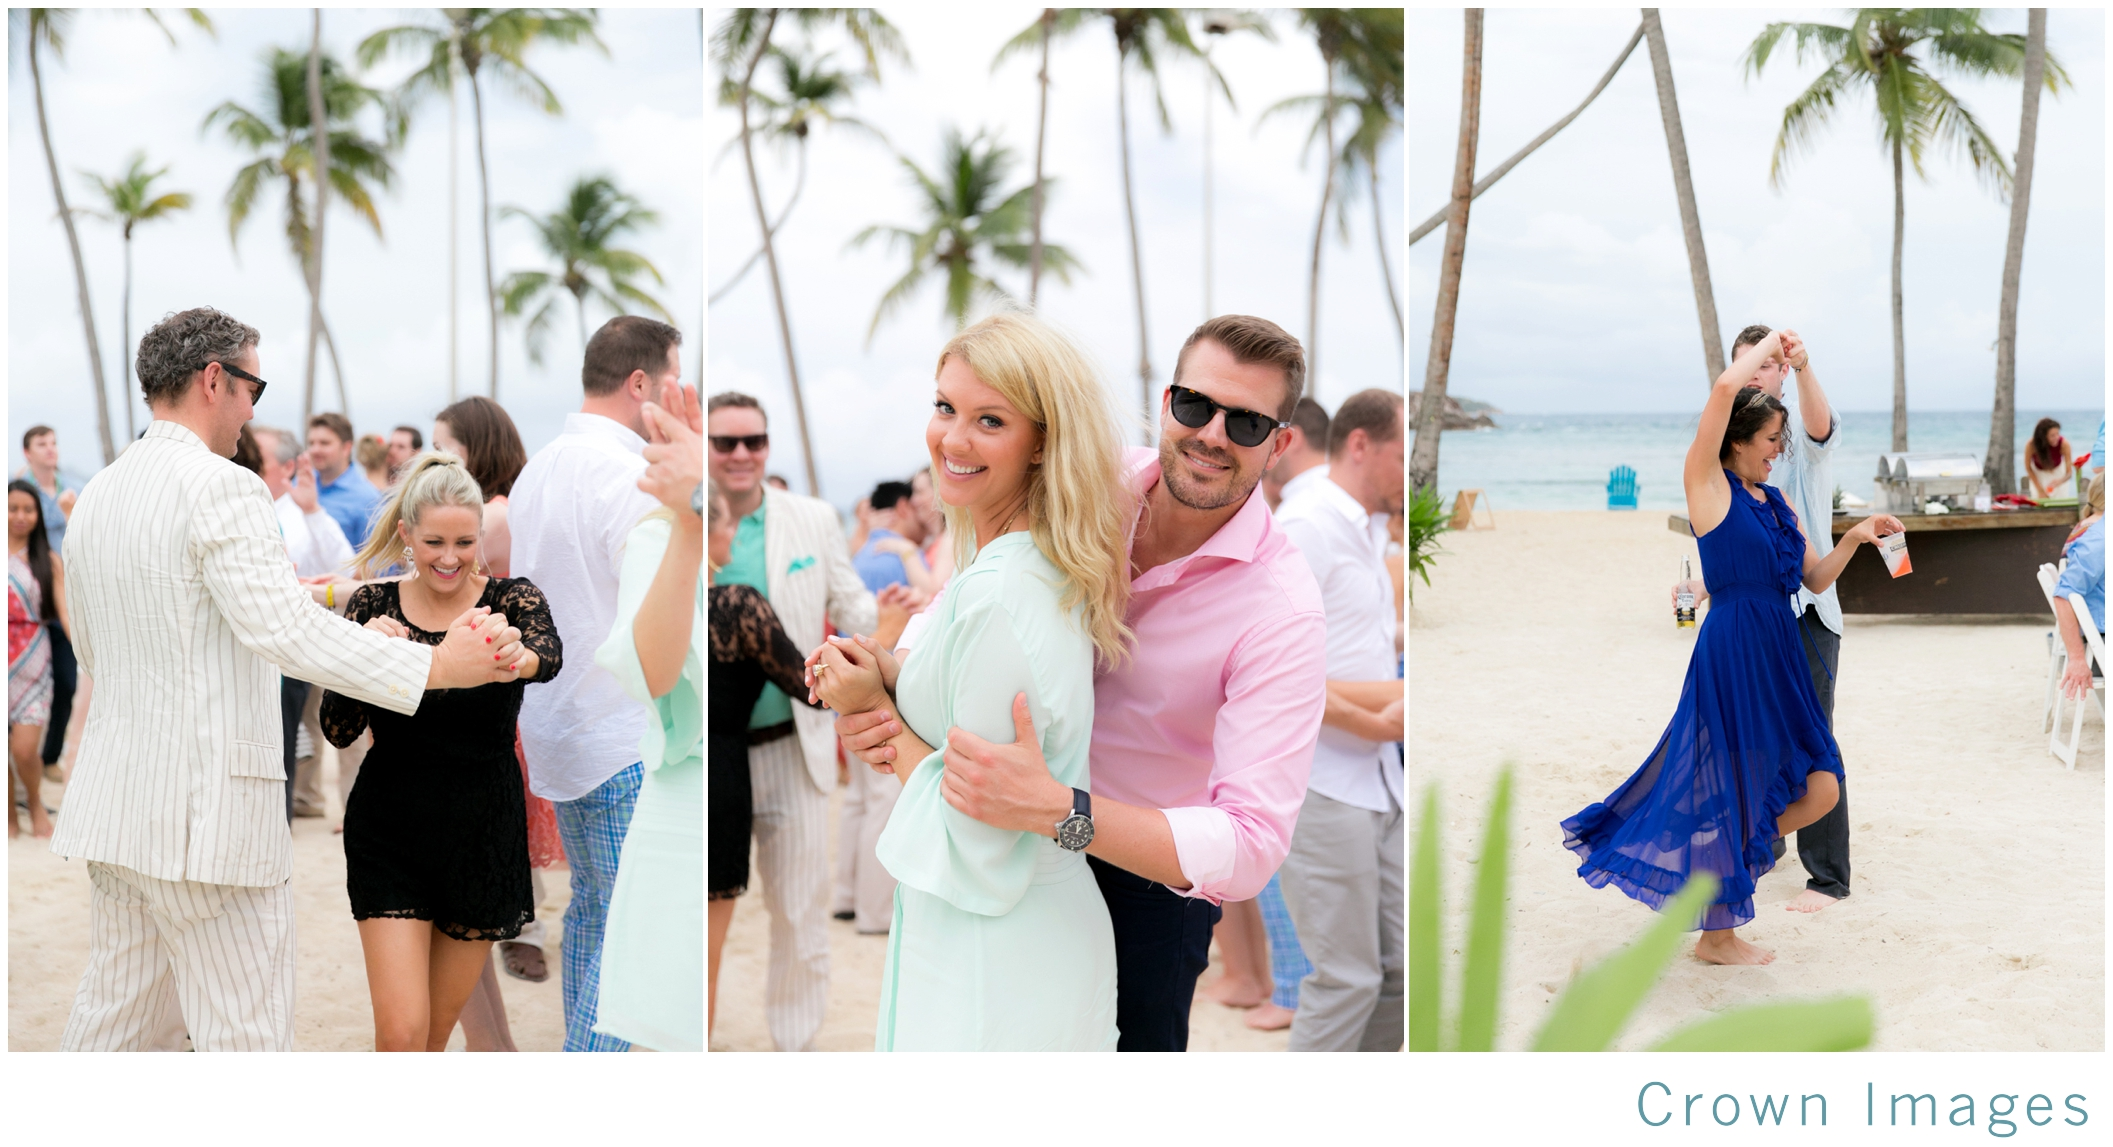 Bolongo bay beach resort wedding photos by crown images_1503.jpg